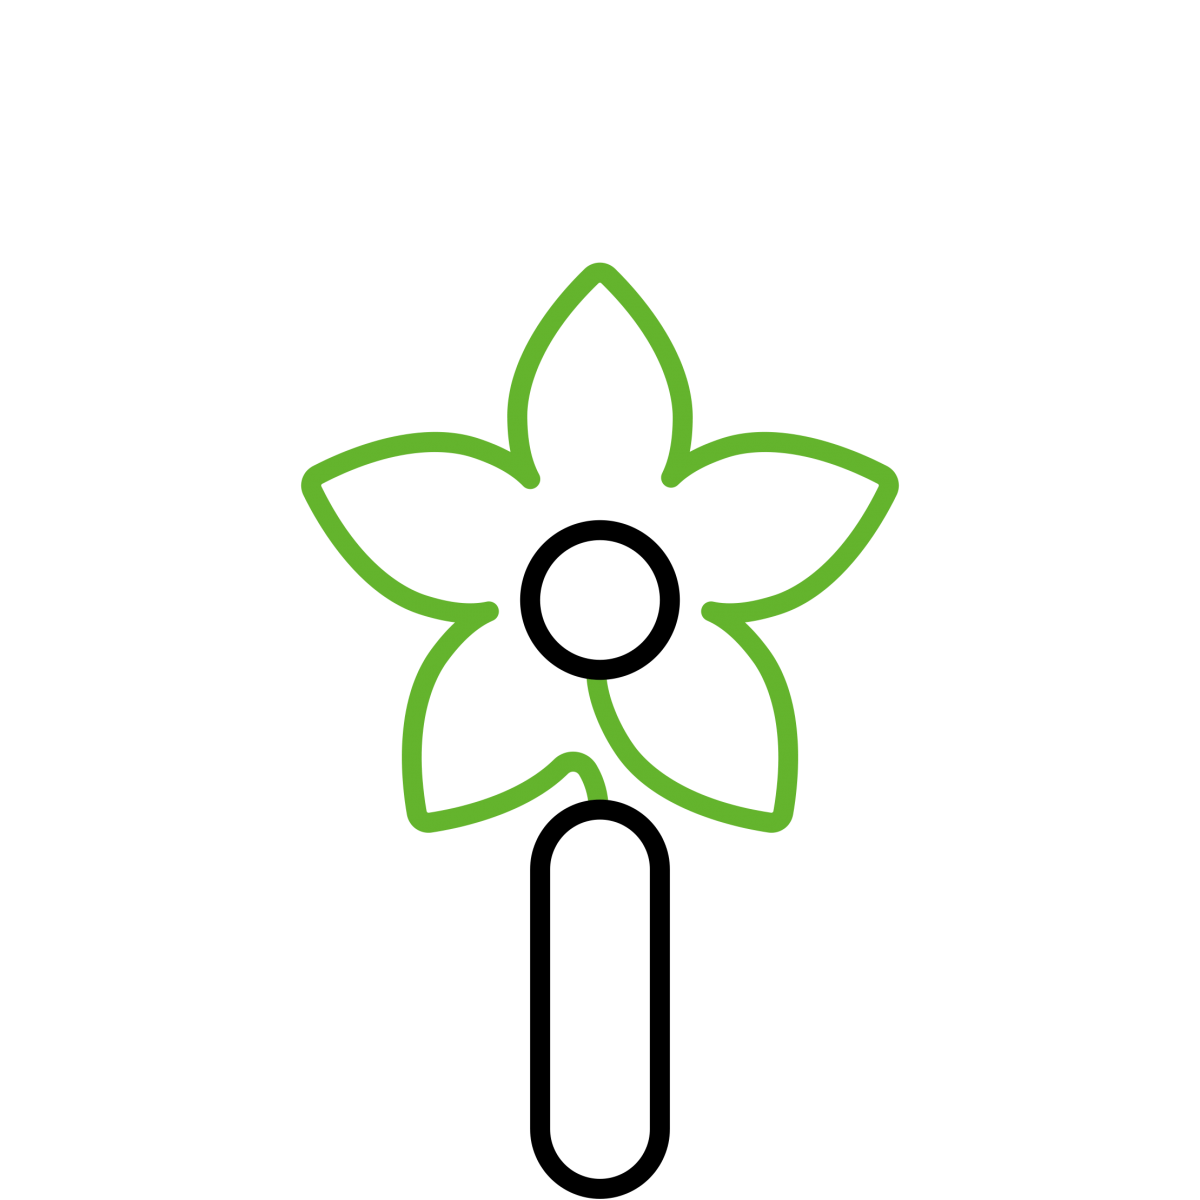 Innogy logo clipart picture transparent stock innogy confirms outlook for 2019 picture transparent stock